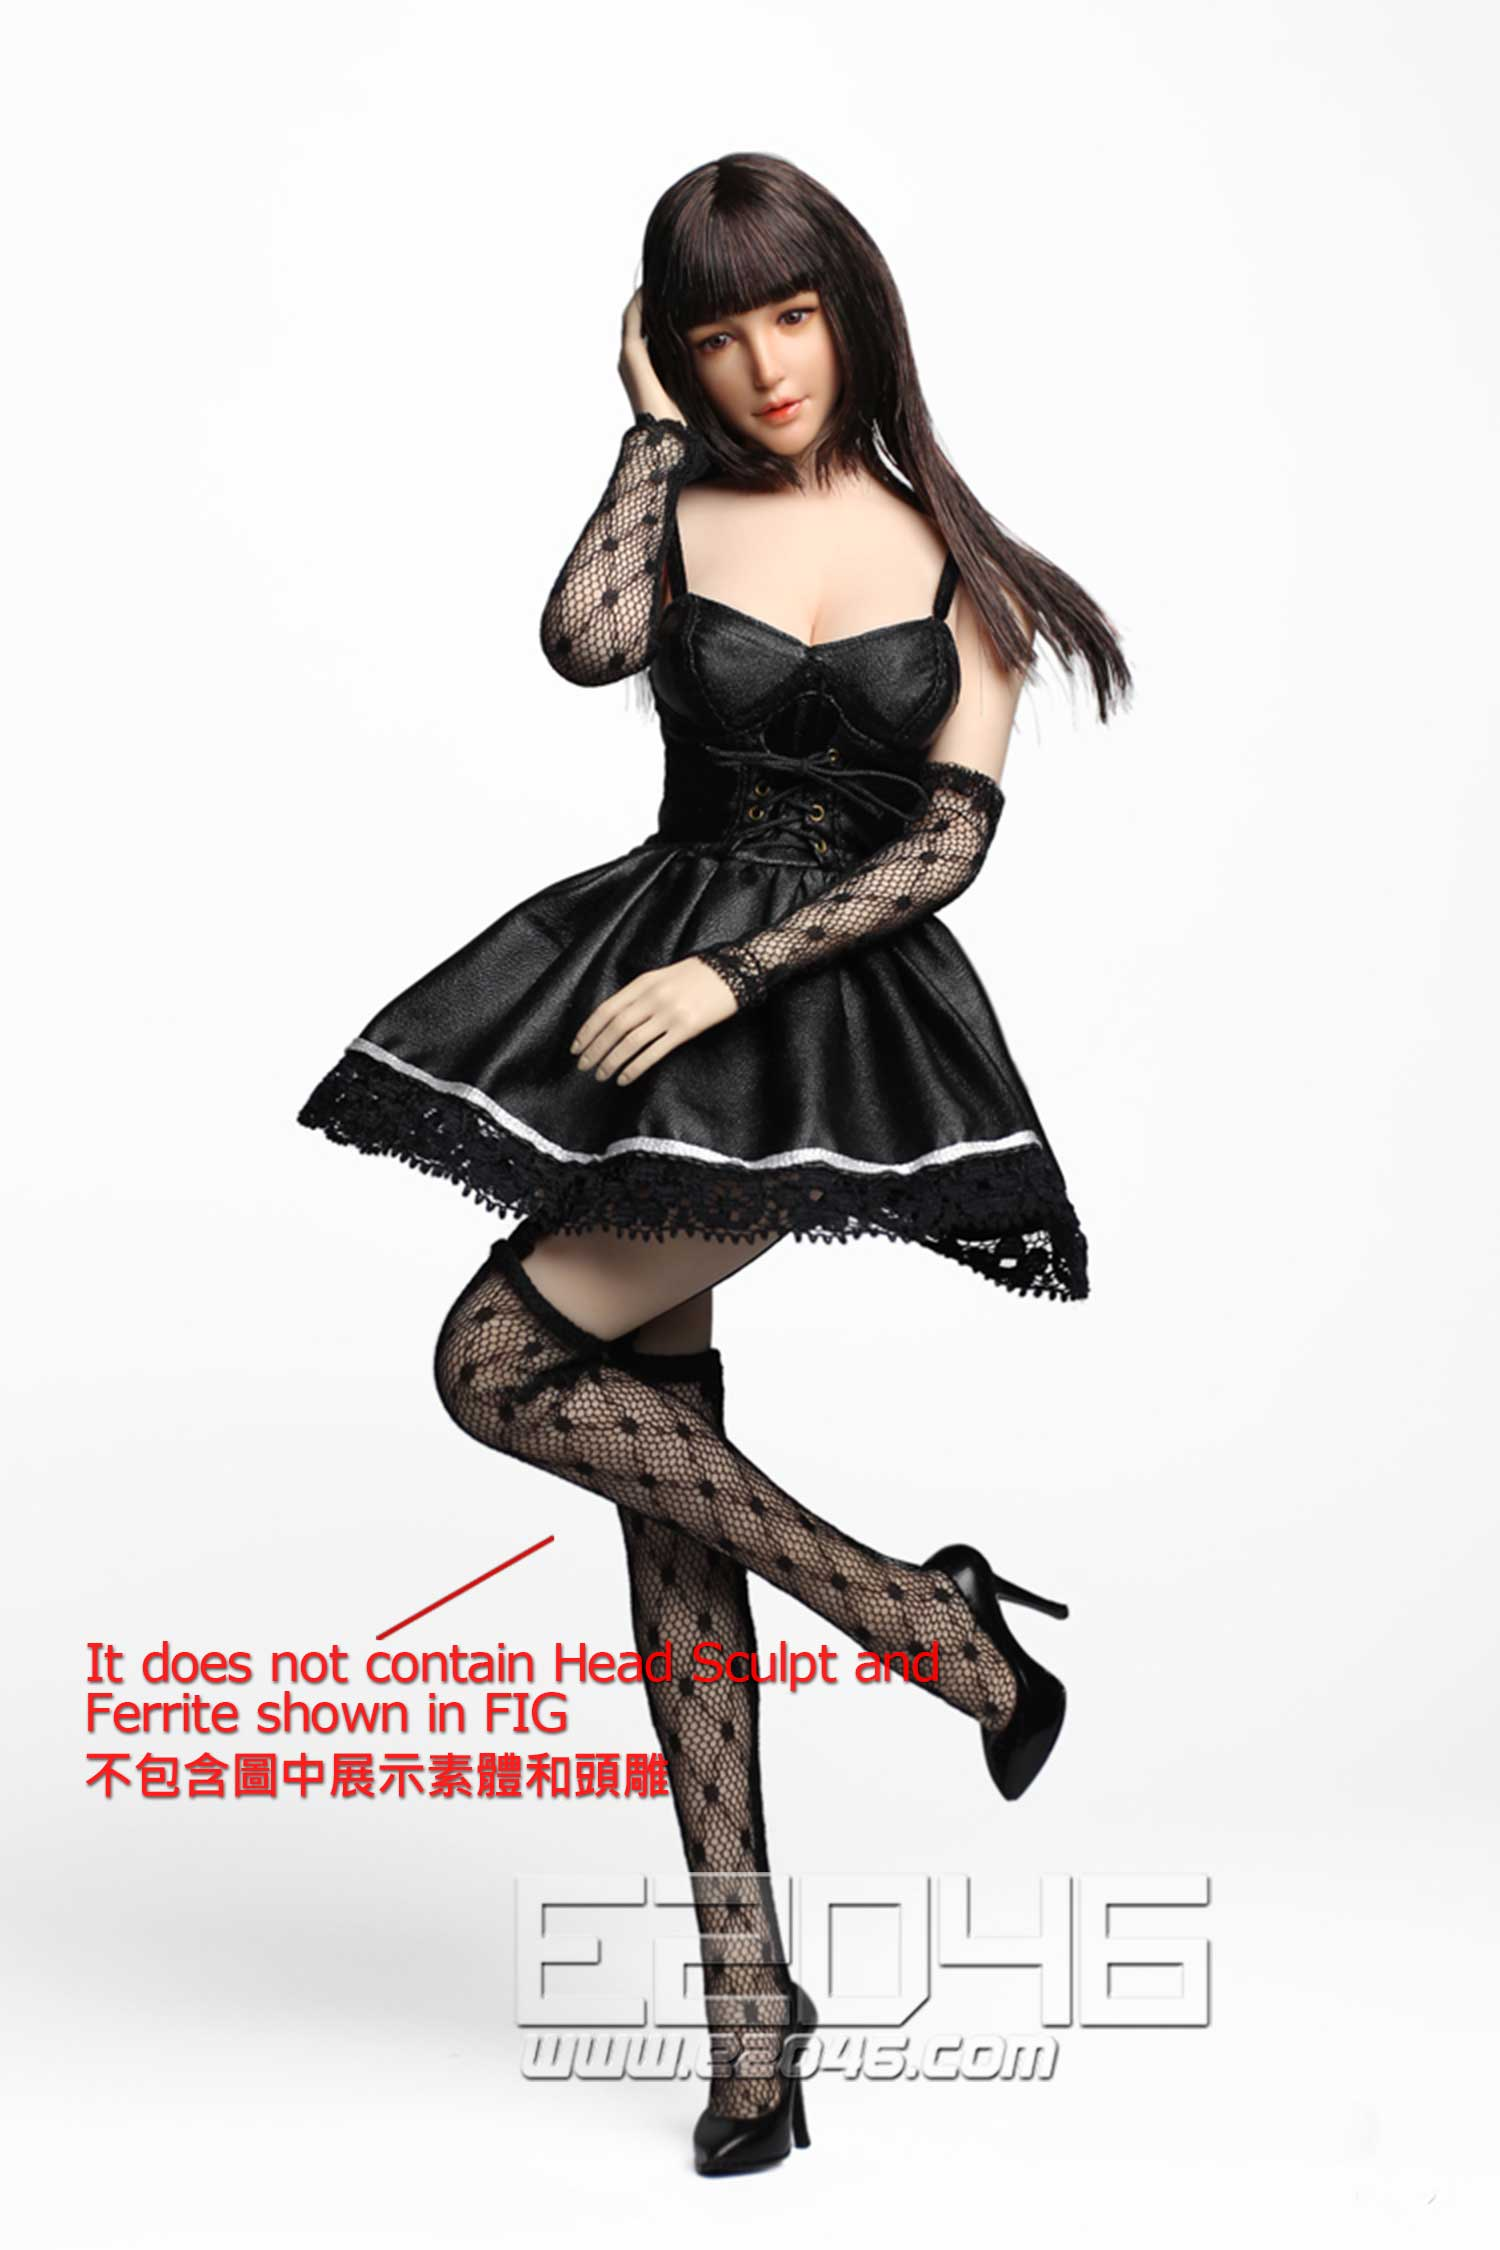 Sexy Dress Suit C (DOLL)